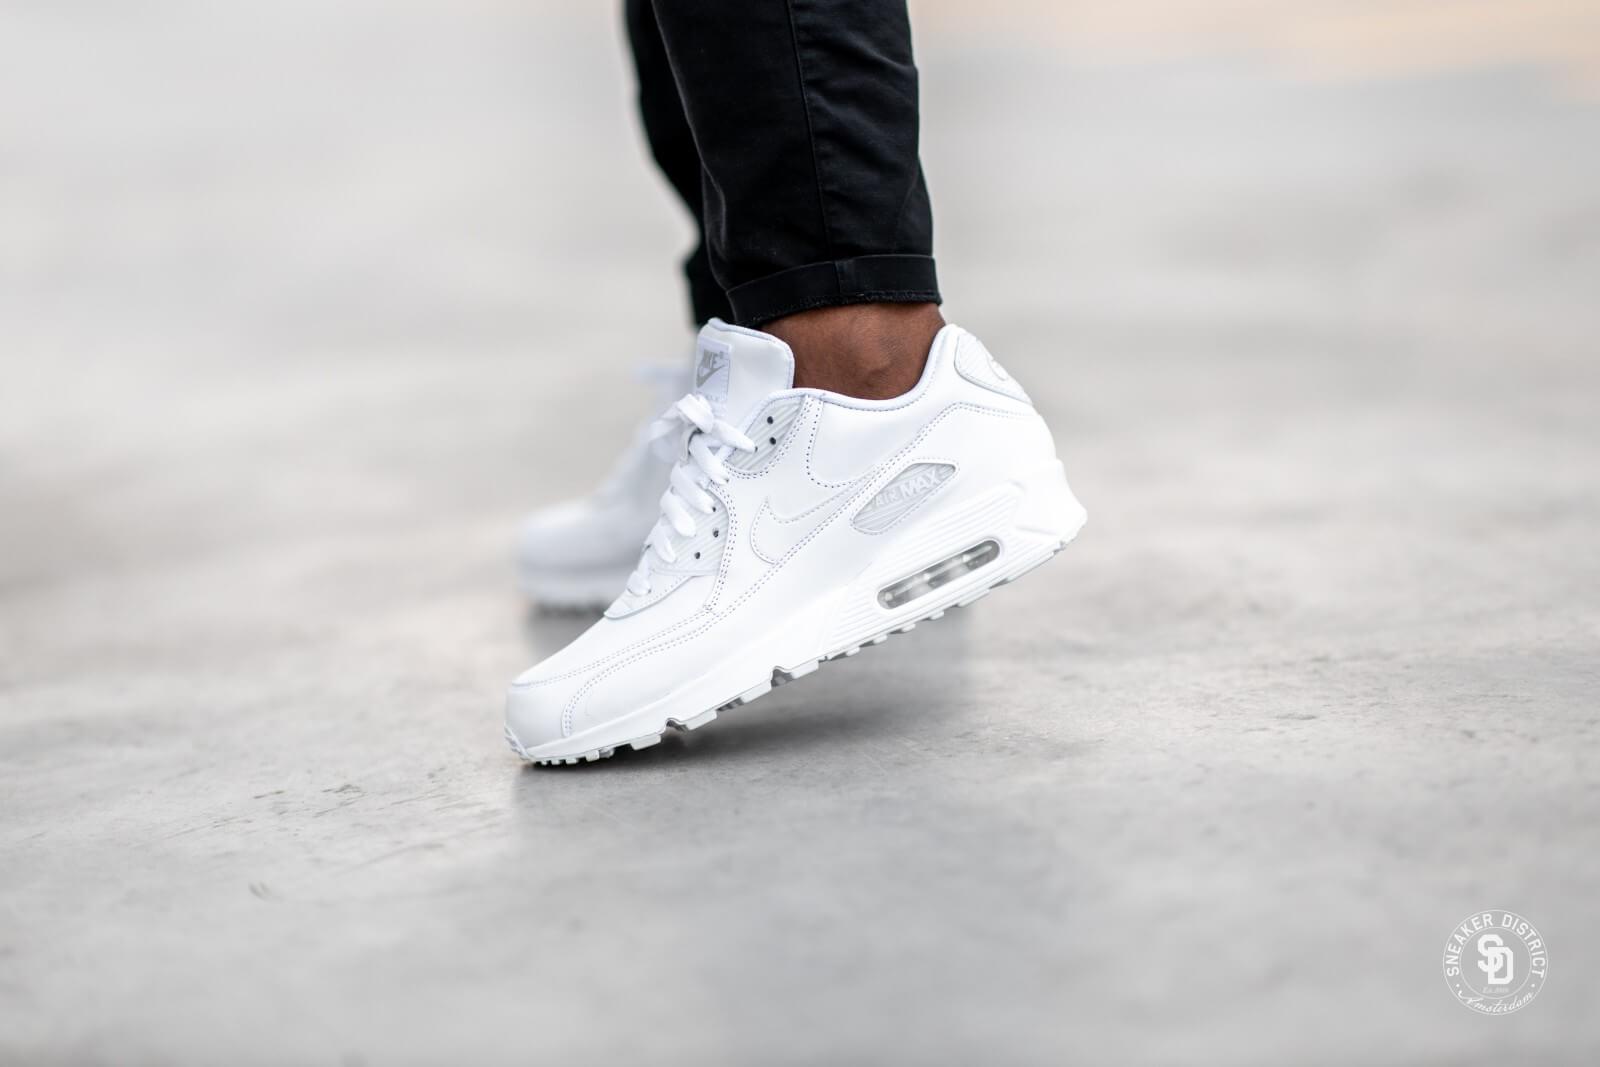 Nike Air Max 90 Leather White White 302519 113